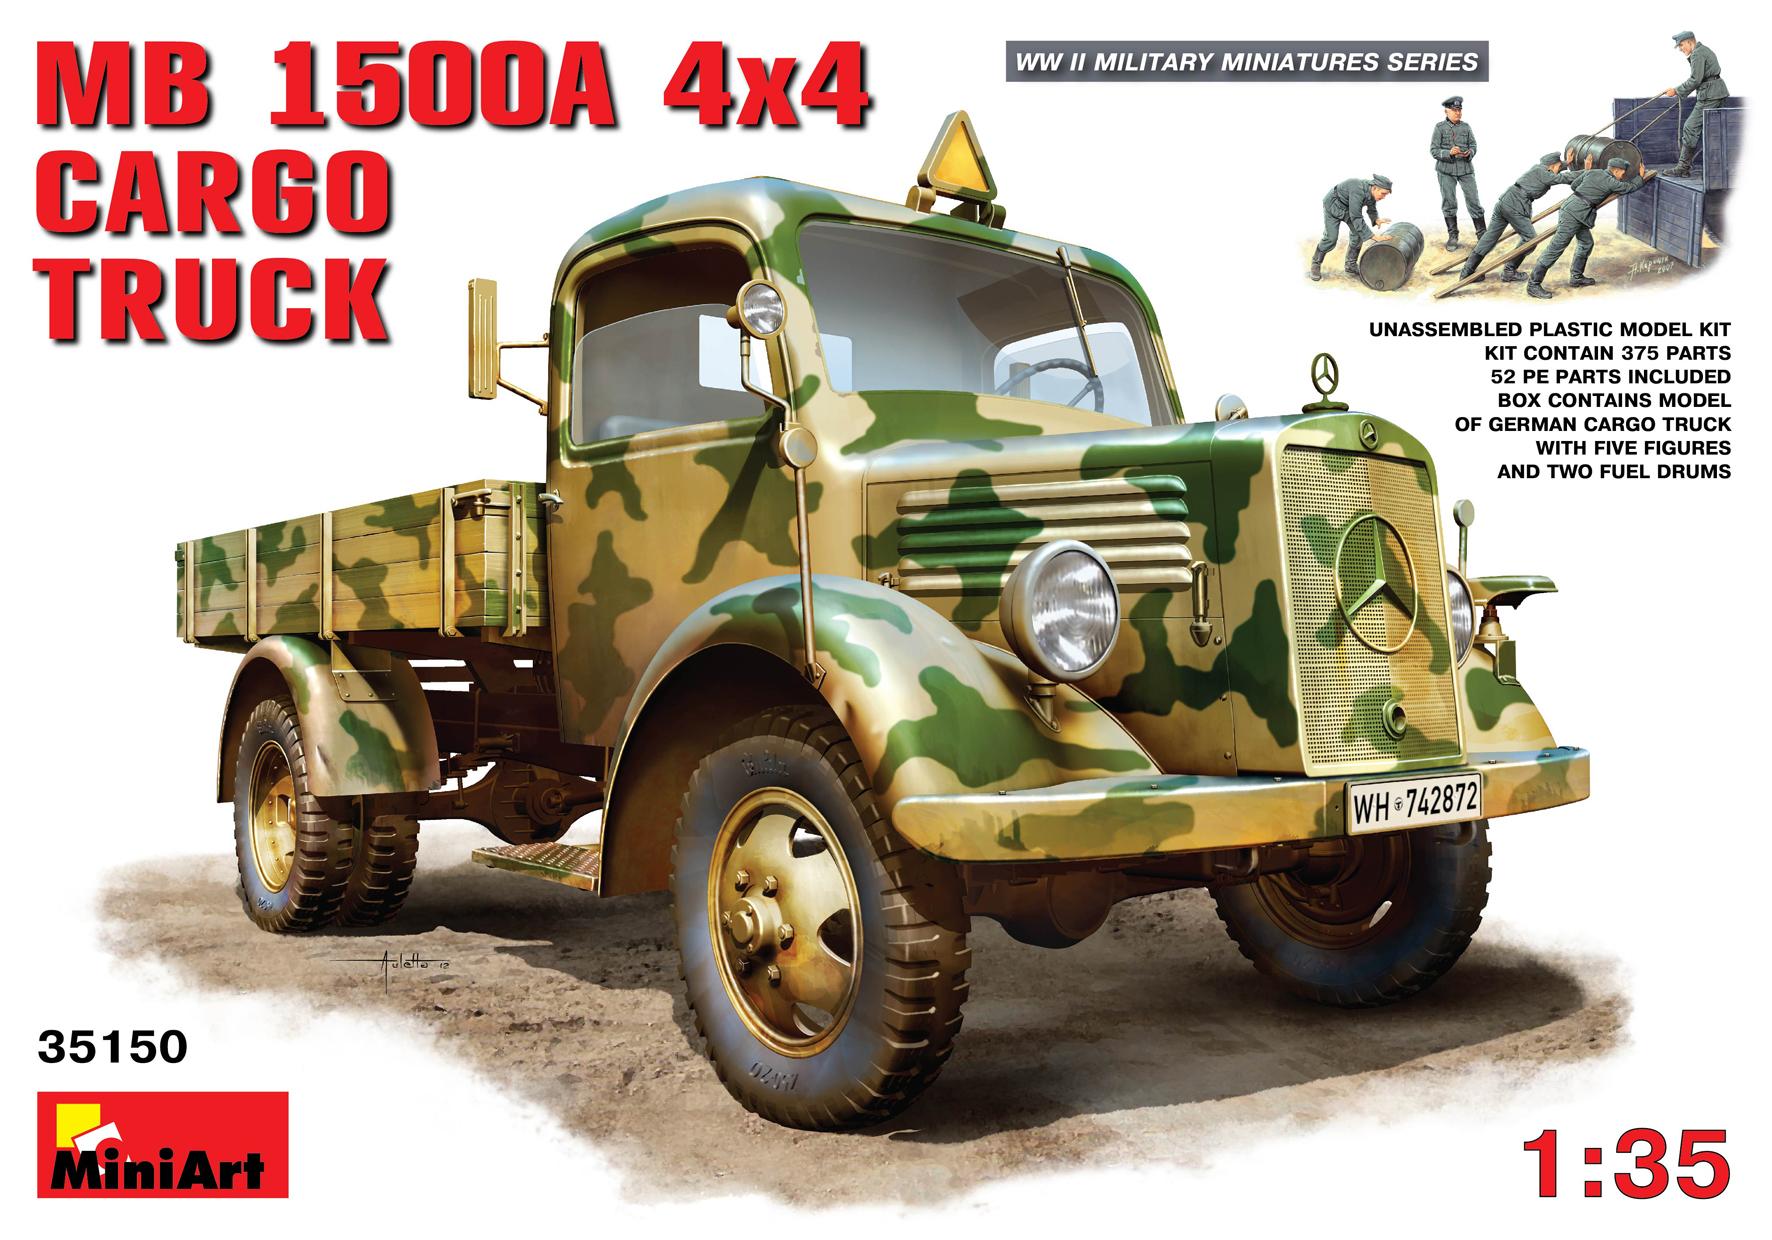 35150 MB 1500A 4×4 CARGO TRUCK